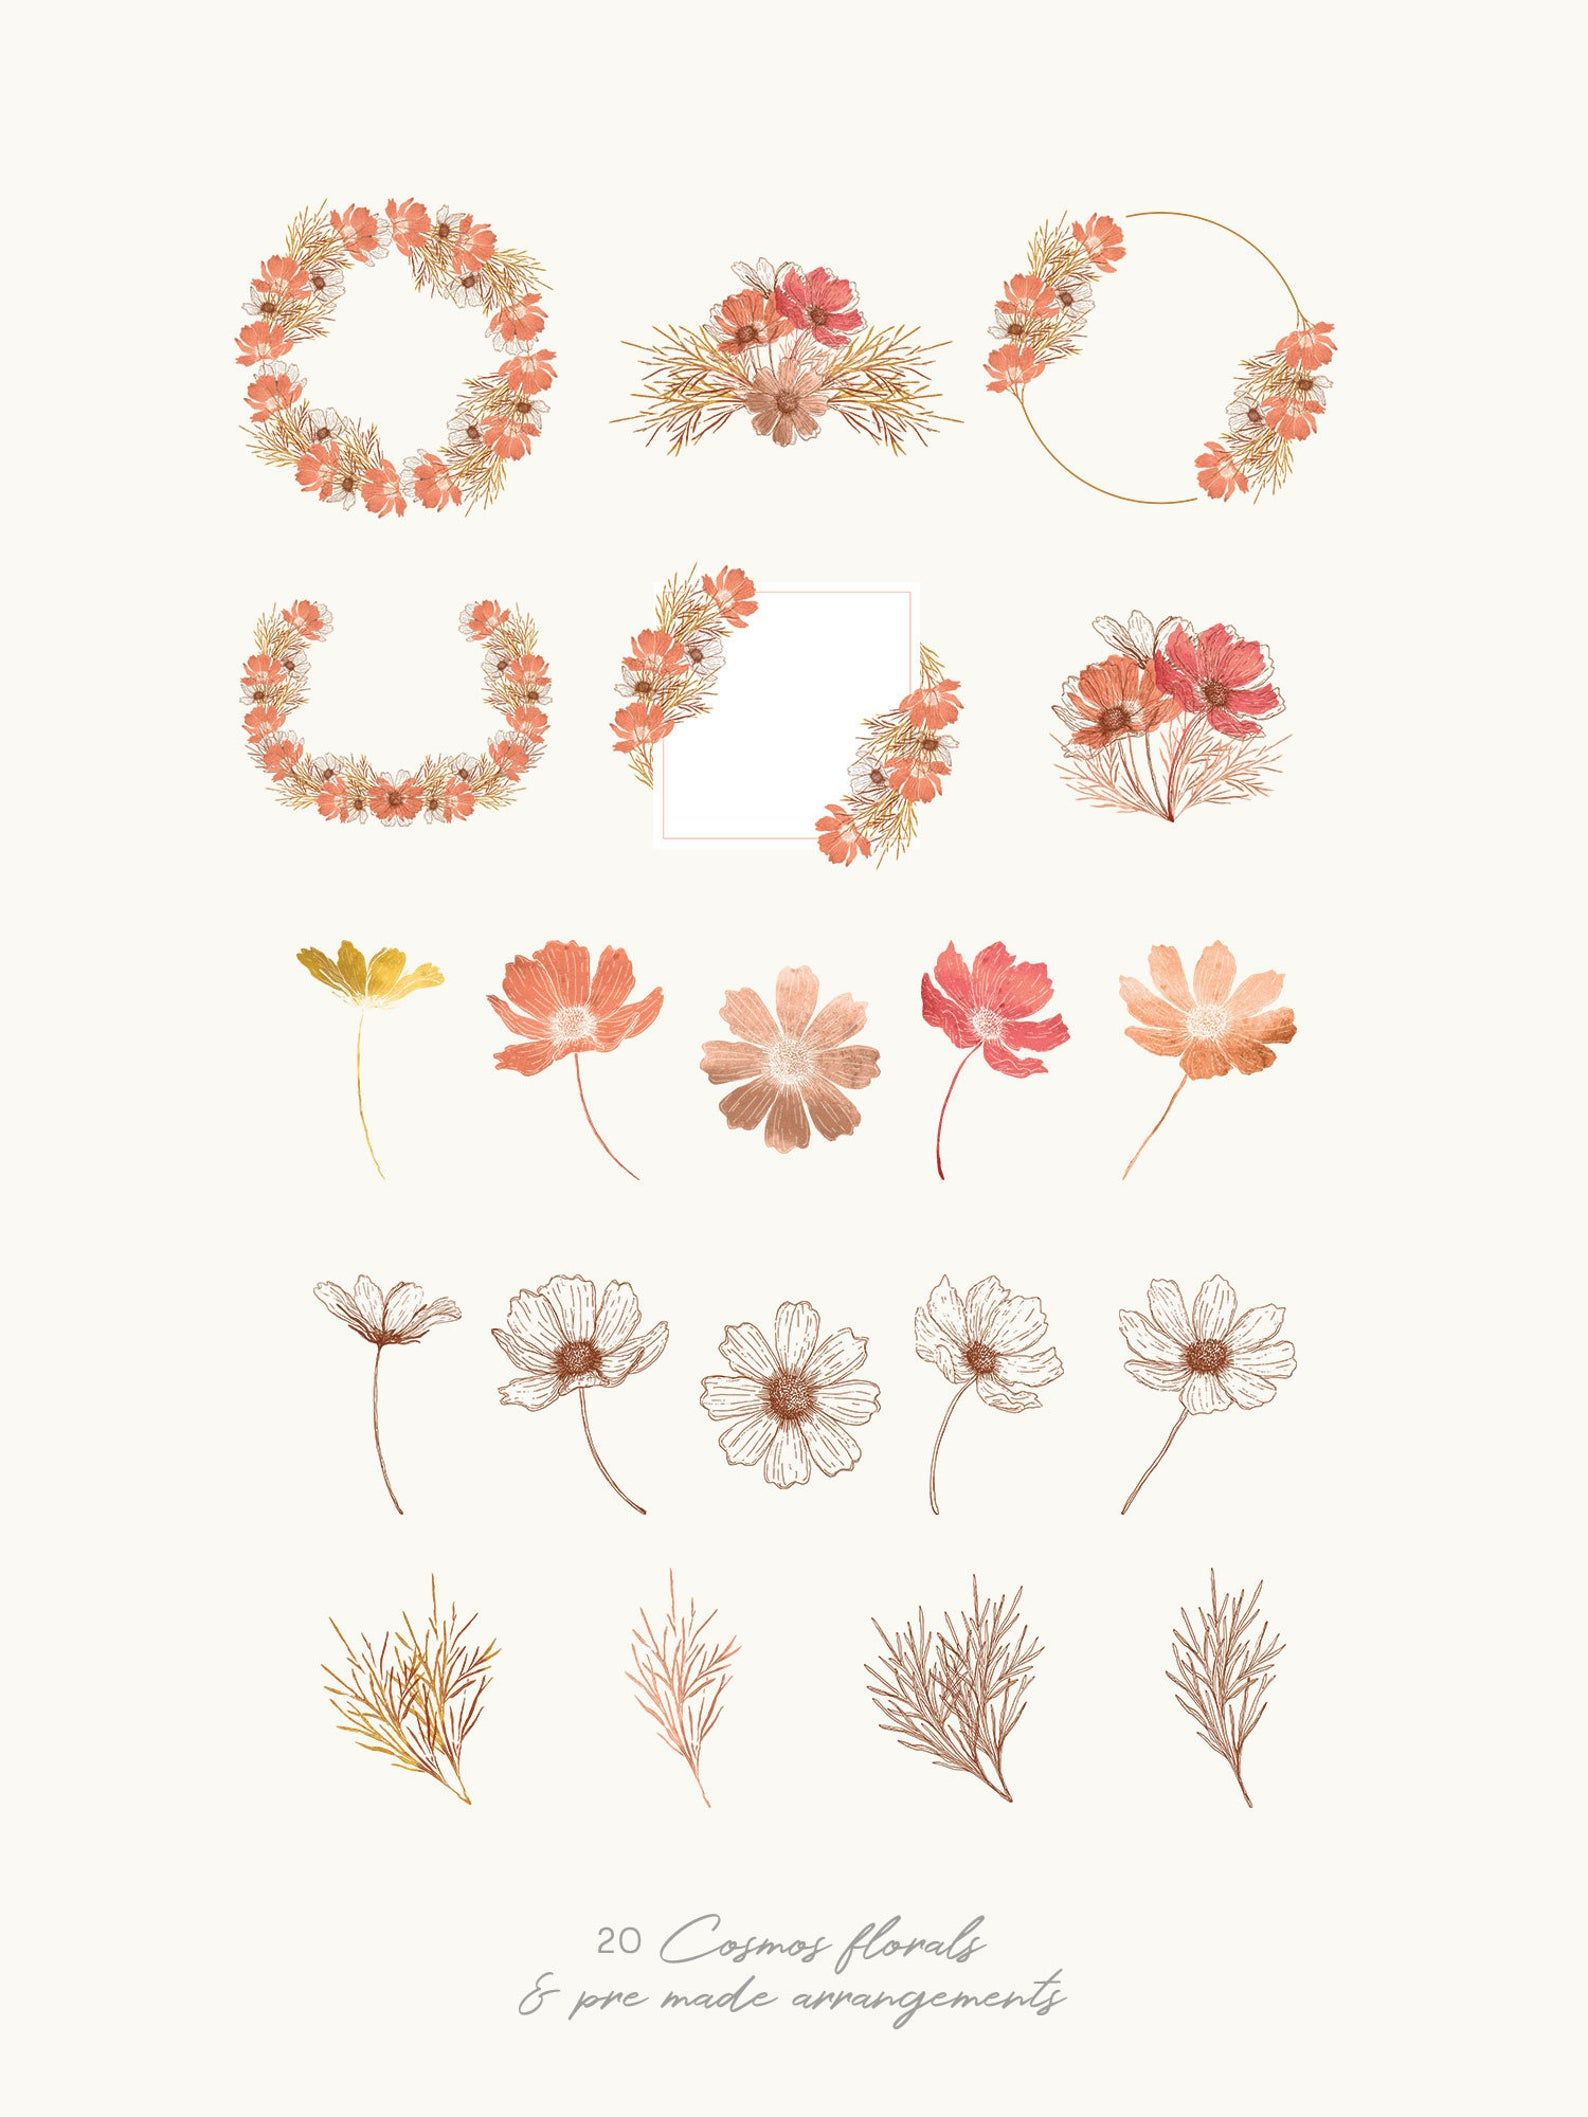 Cosmos Flowers clipart burnt orange watercolor illustration & | Etsy